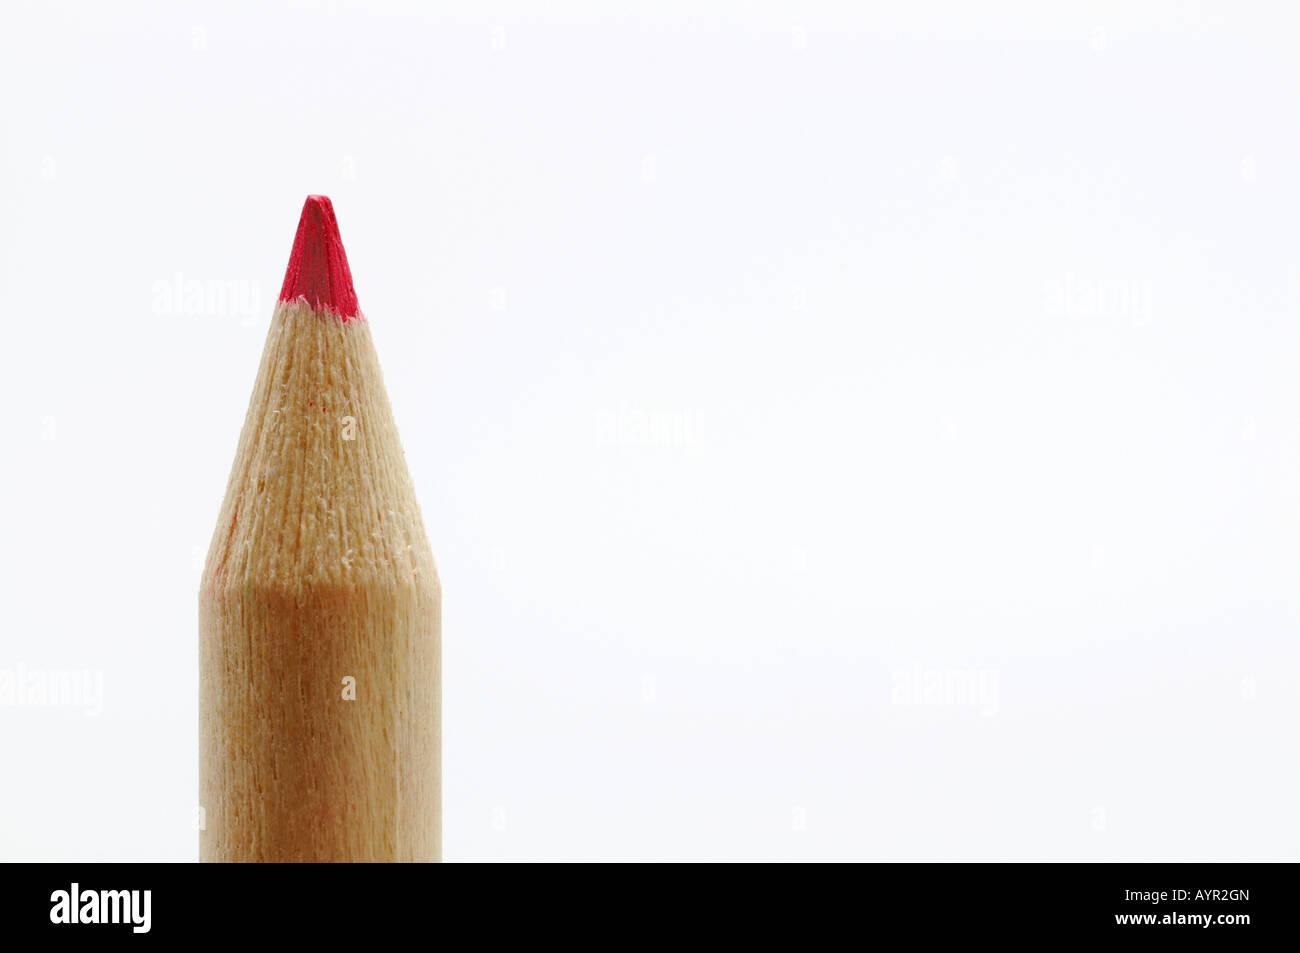 Red pencil crayon - Stock Image